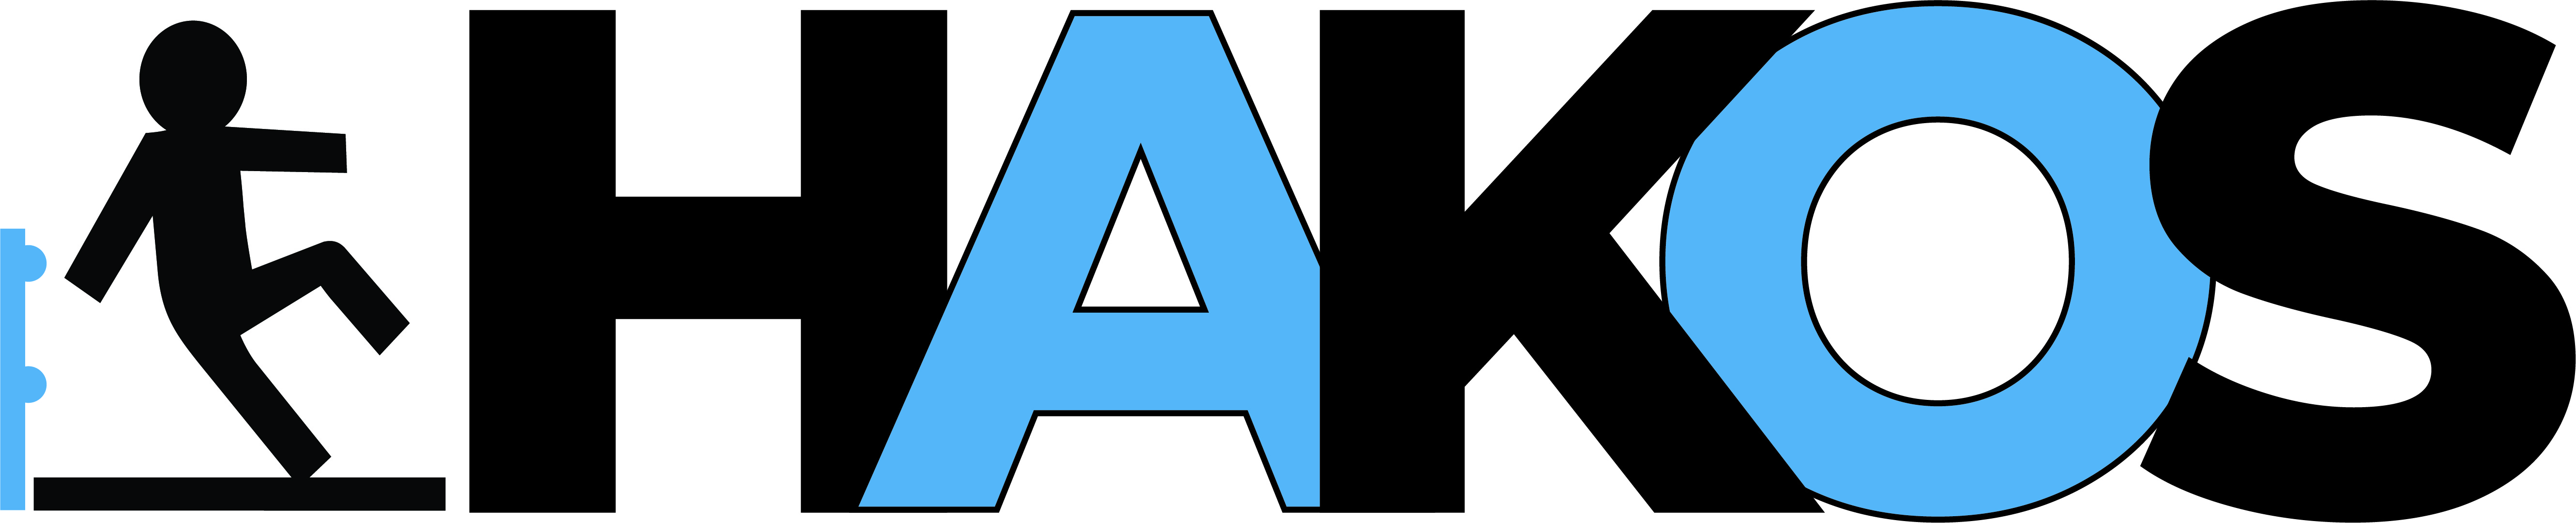 HAKOS GmbH